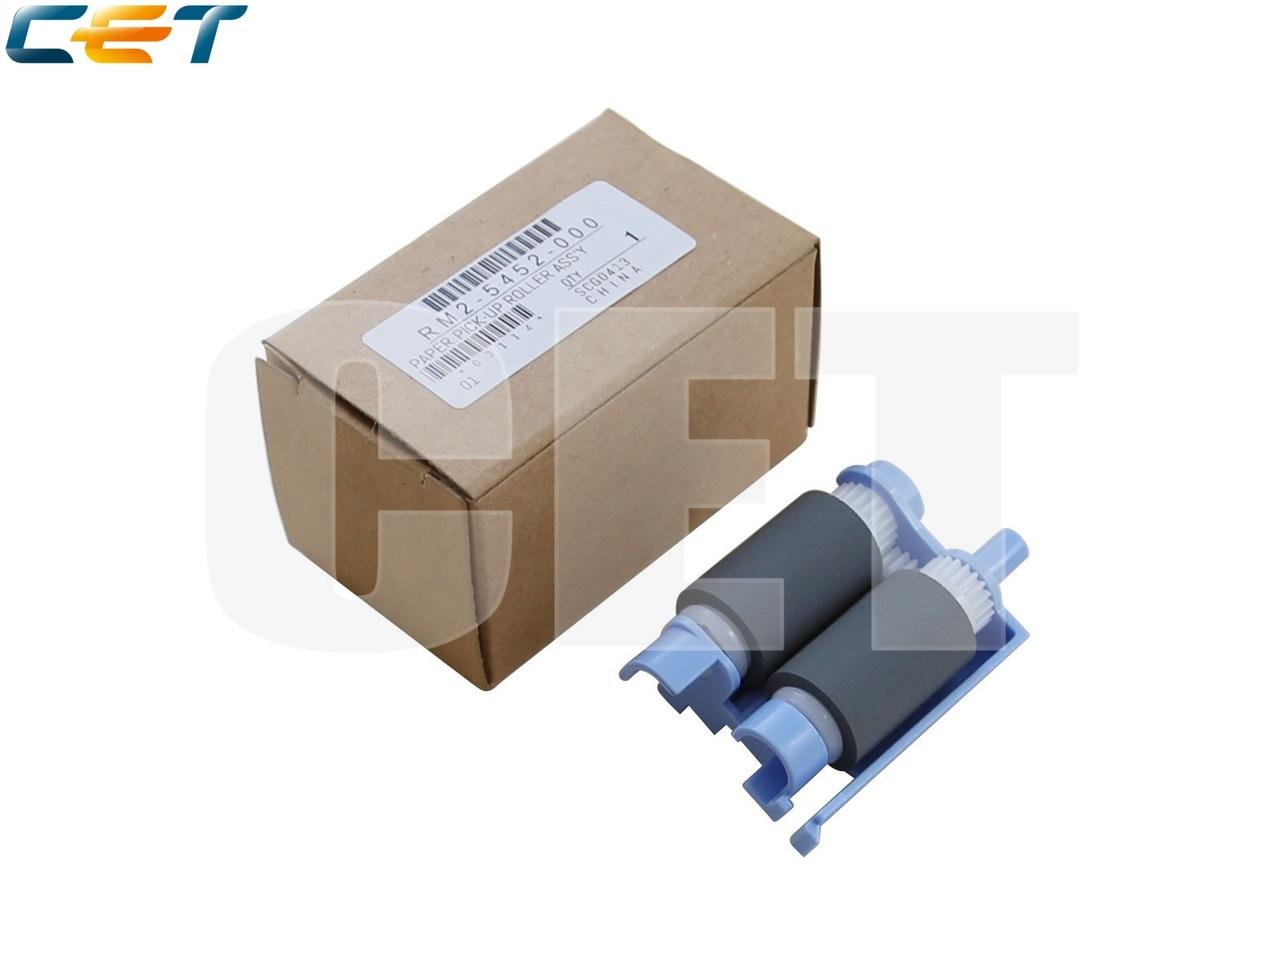 Сборка роликов подхвата/подачи 2-го лотка RM2-5452-000 дляHP LaserJet Pro M402/403/M426/427 (CET), CET3114